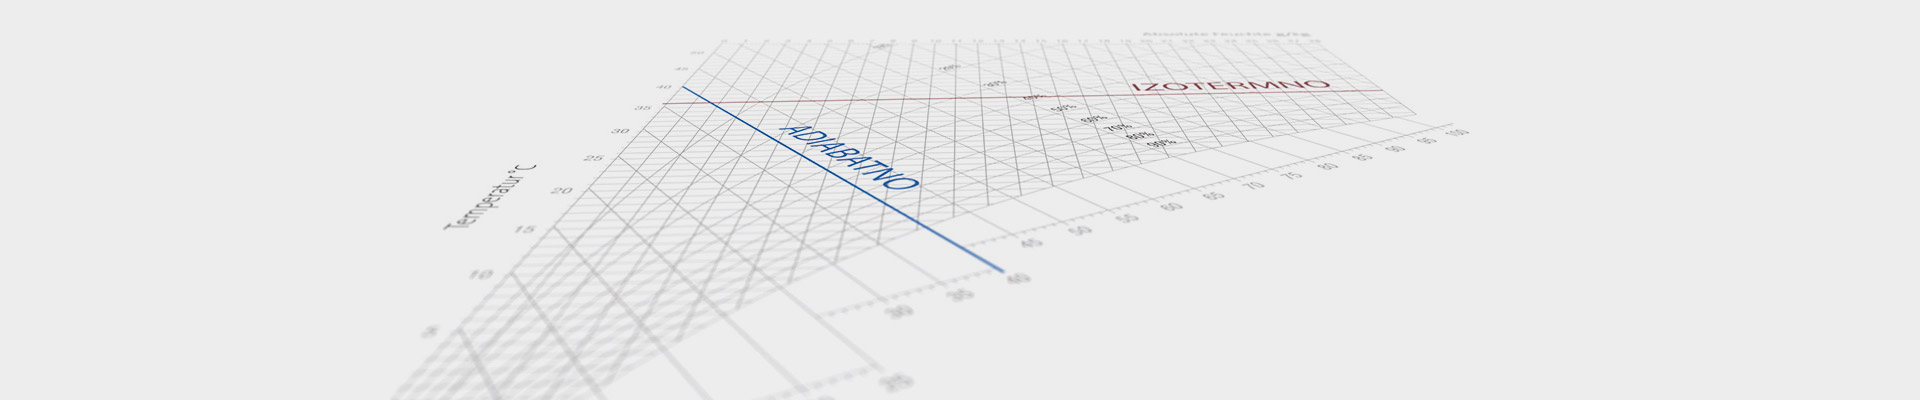 hx grafikon